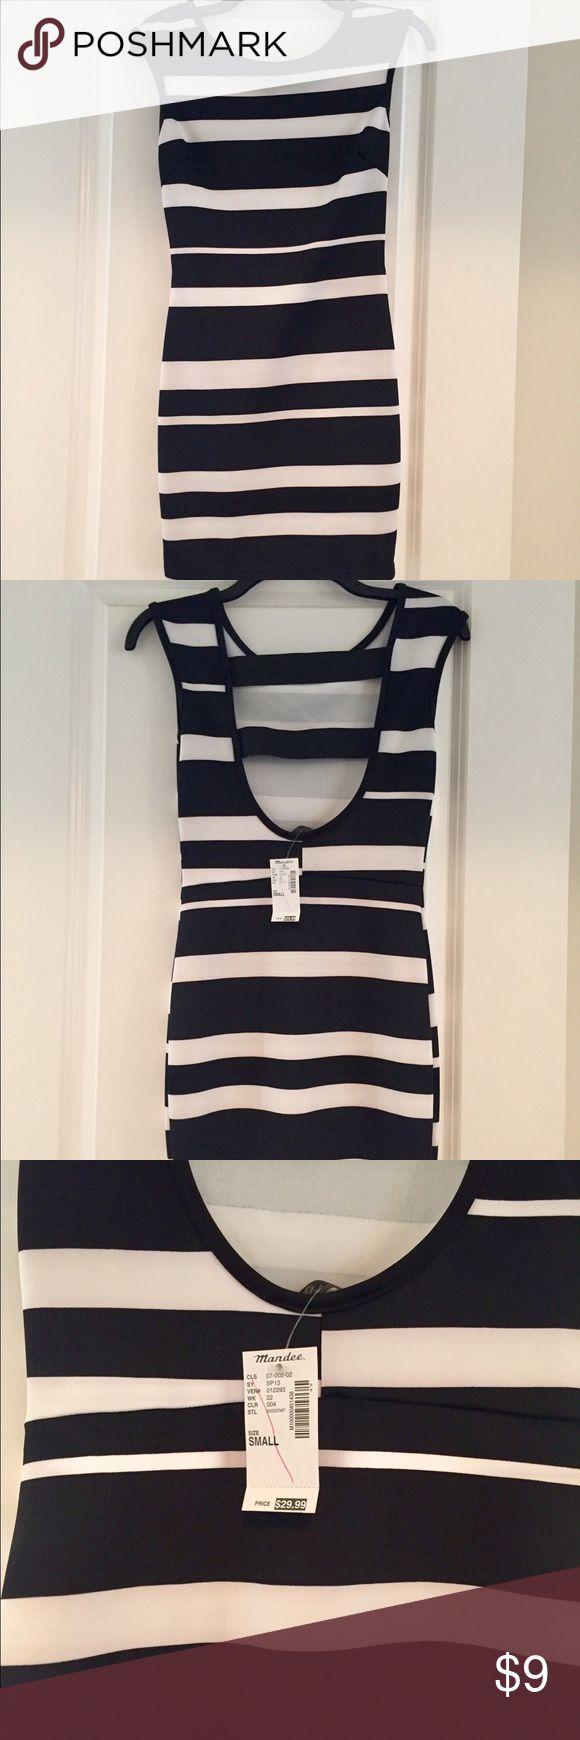 Mandee black and white stripe dress NWT Mandee black and white stripe cocktail dress, open back, size S, brand new with tags Mandee Dresses Mini